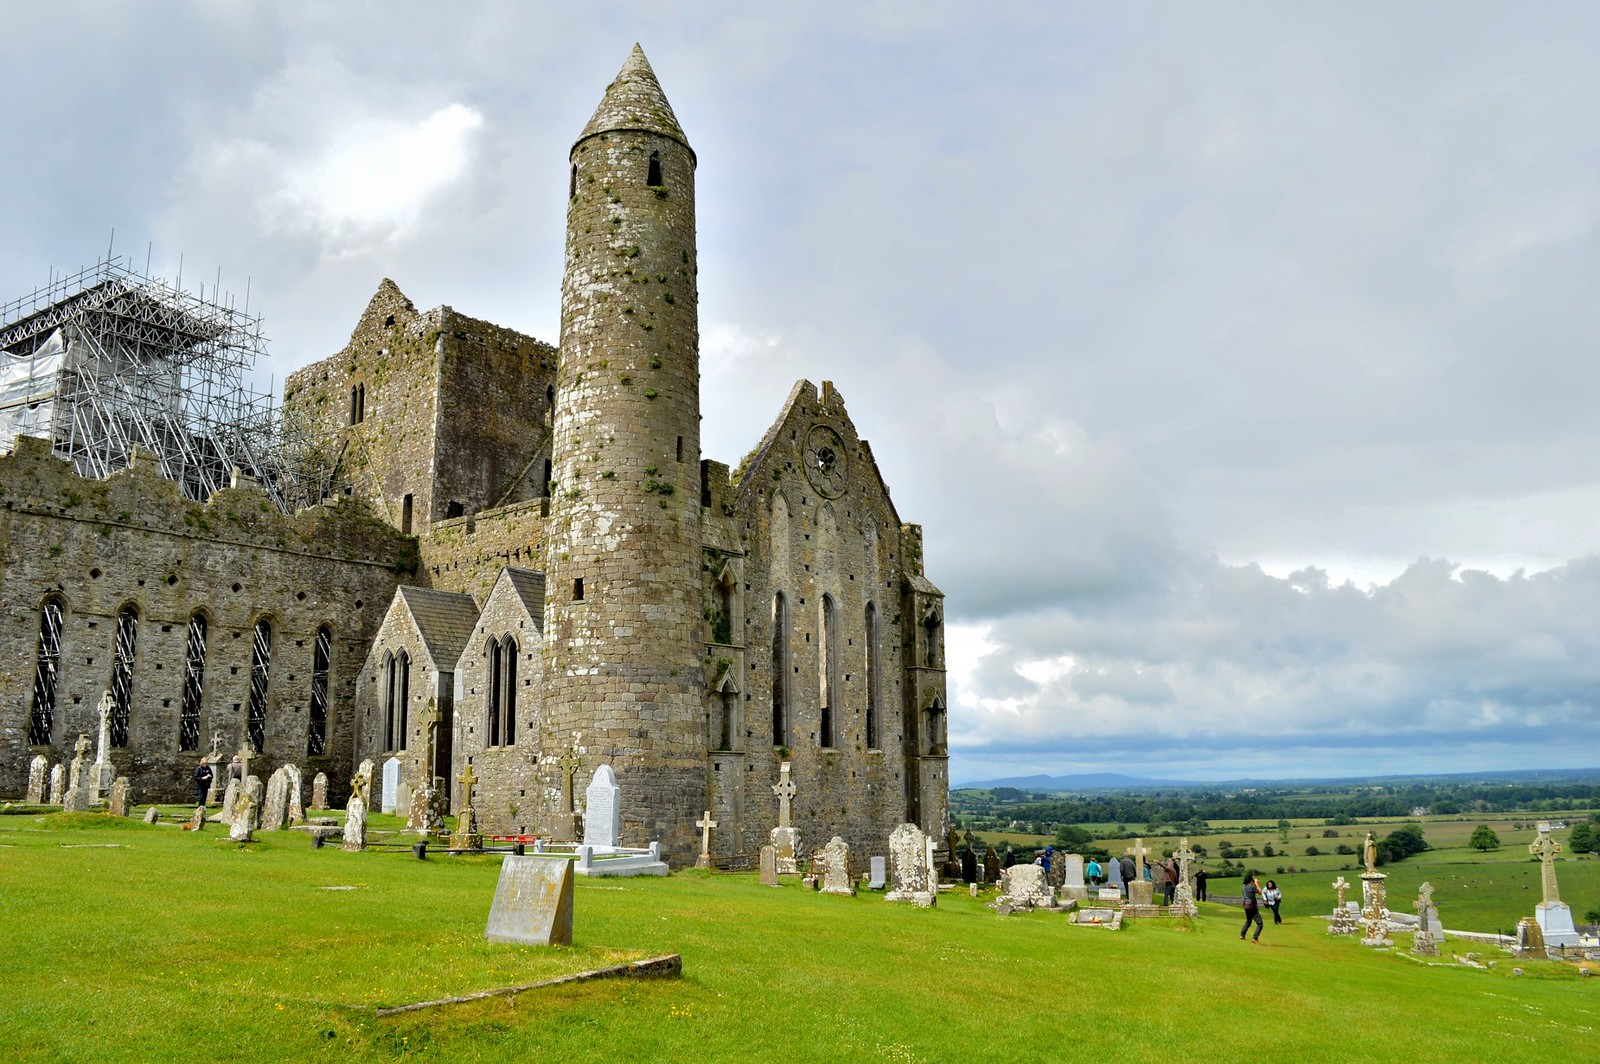 Rock of Cashel: The most beautiful ruin in Ireland?